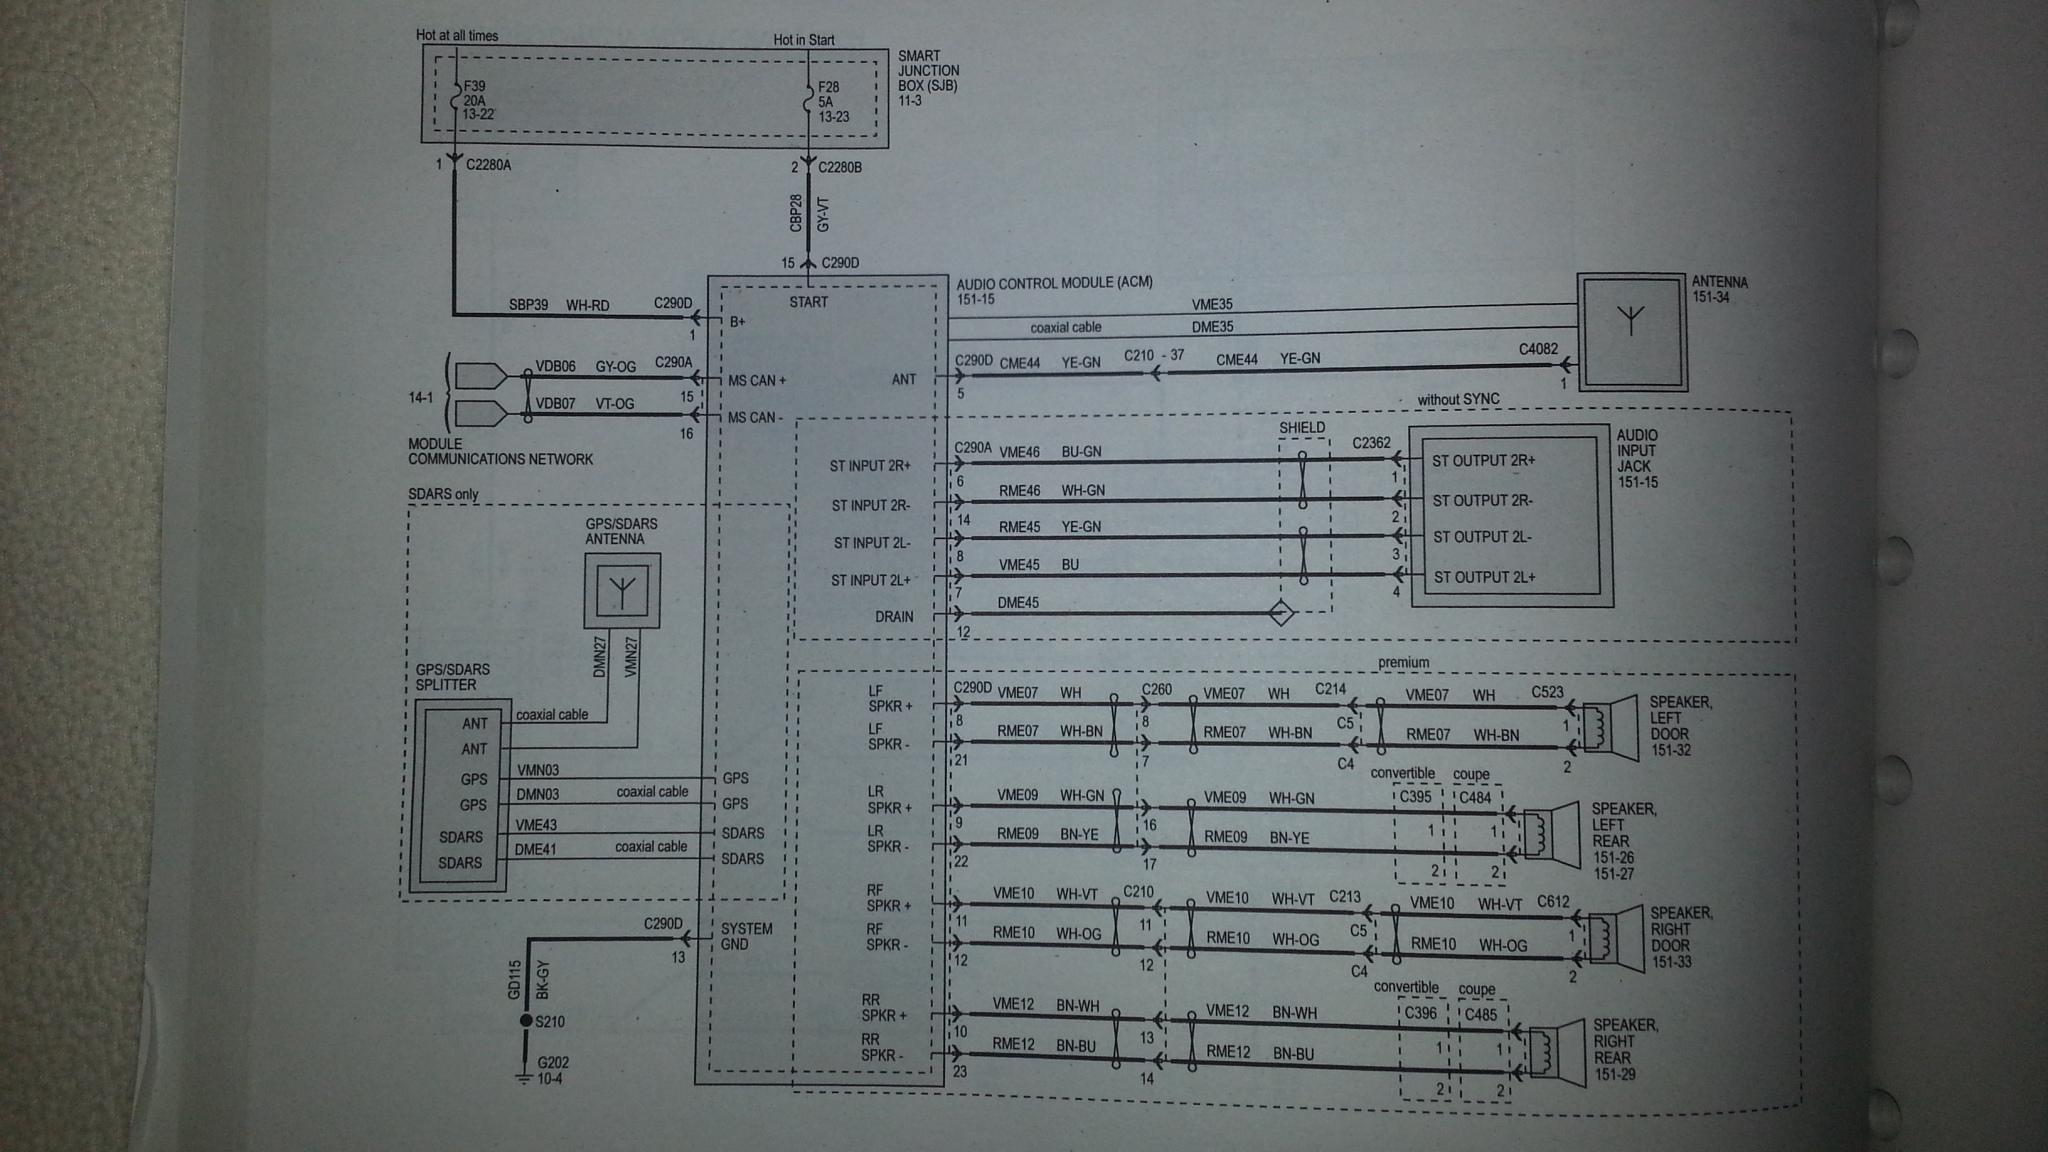 2005 Mustang Shaker 500 Wiring Diagram My Wallpaper - Smart Wiring ...